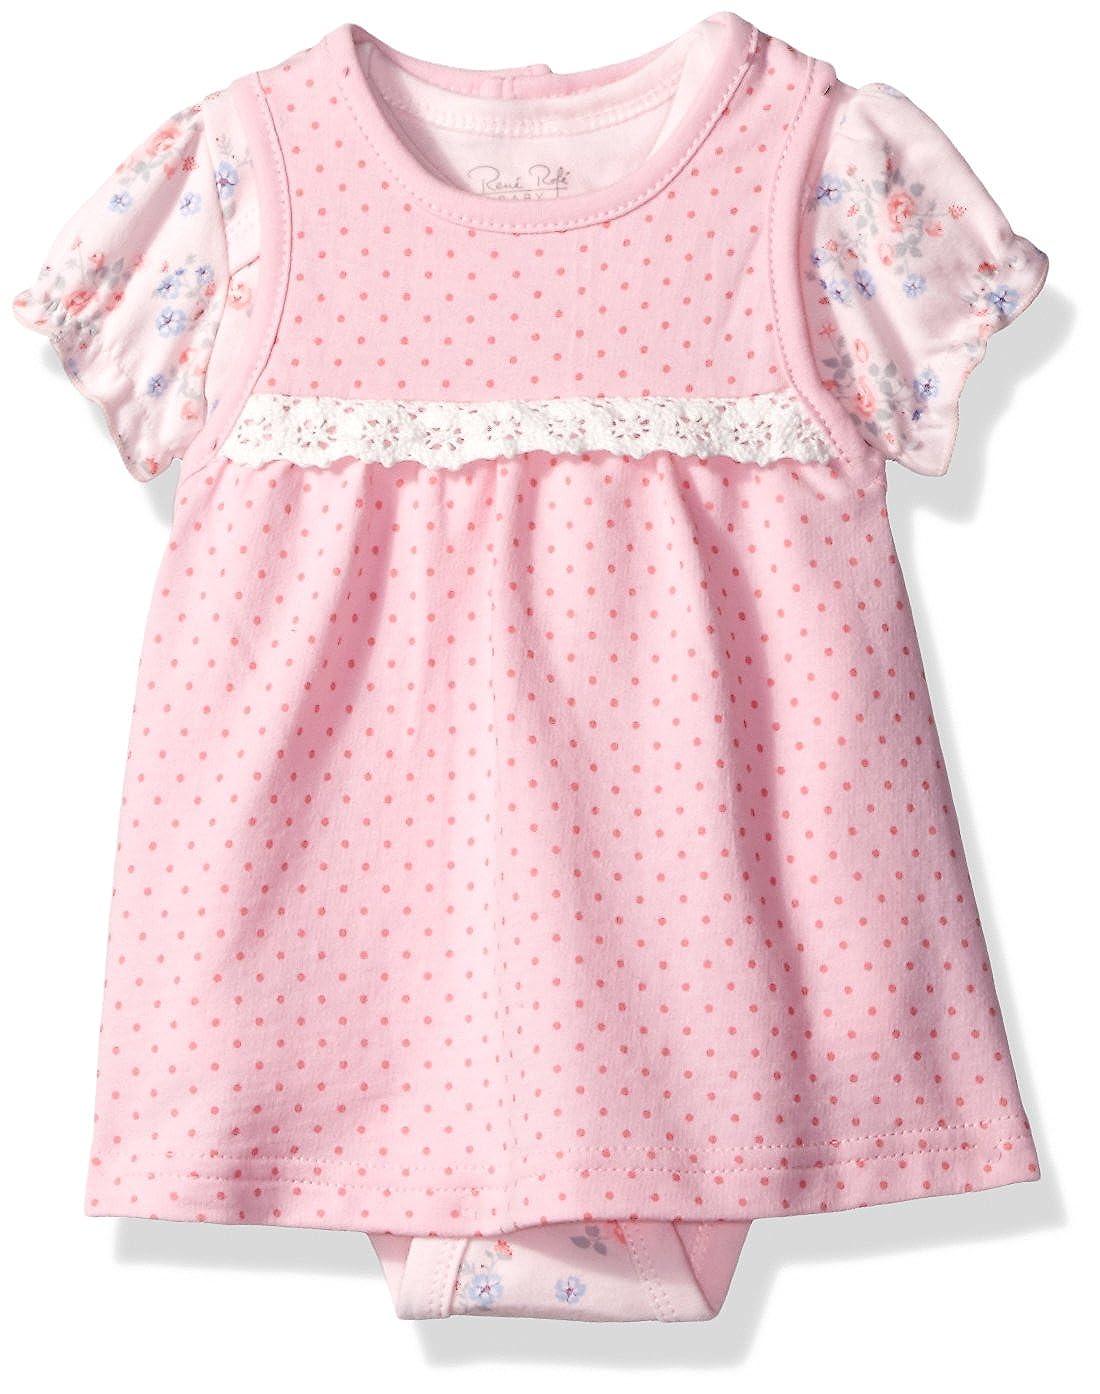 Rene Rofe Baby DRESS ベビーガールズ 6 - 9 Months Pink Polka Dots B01N2Y0674